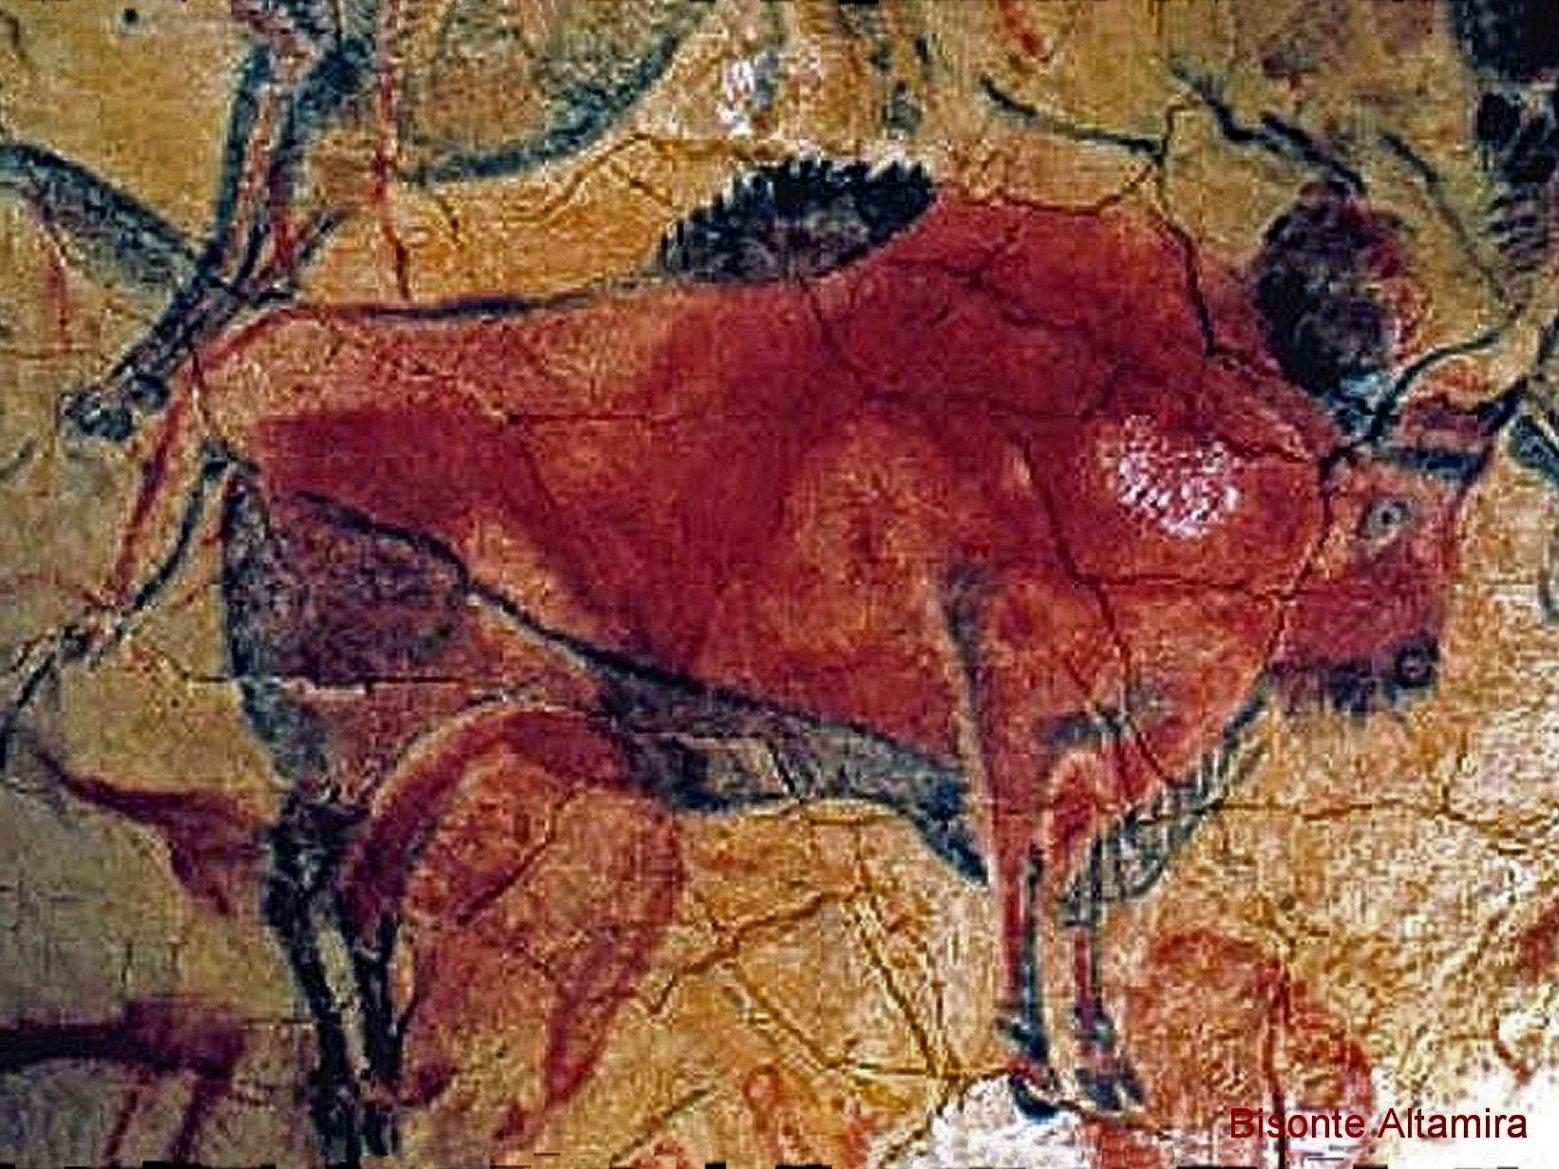 altamira-bison